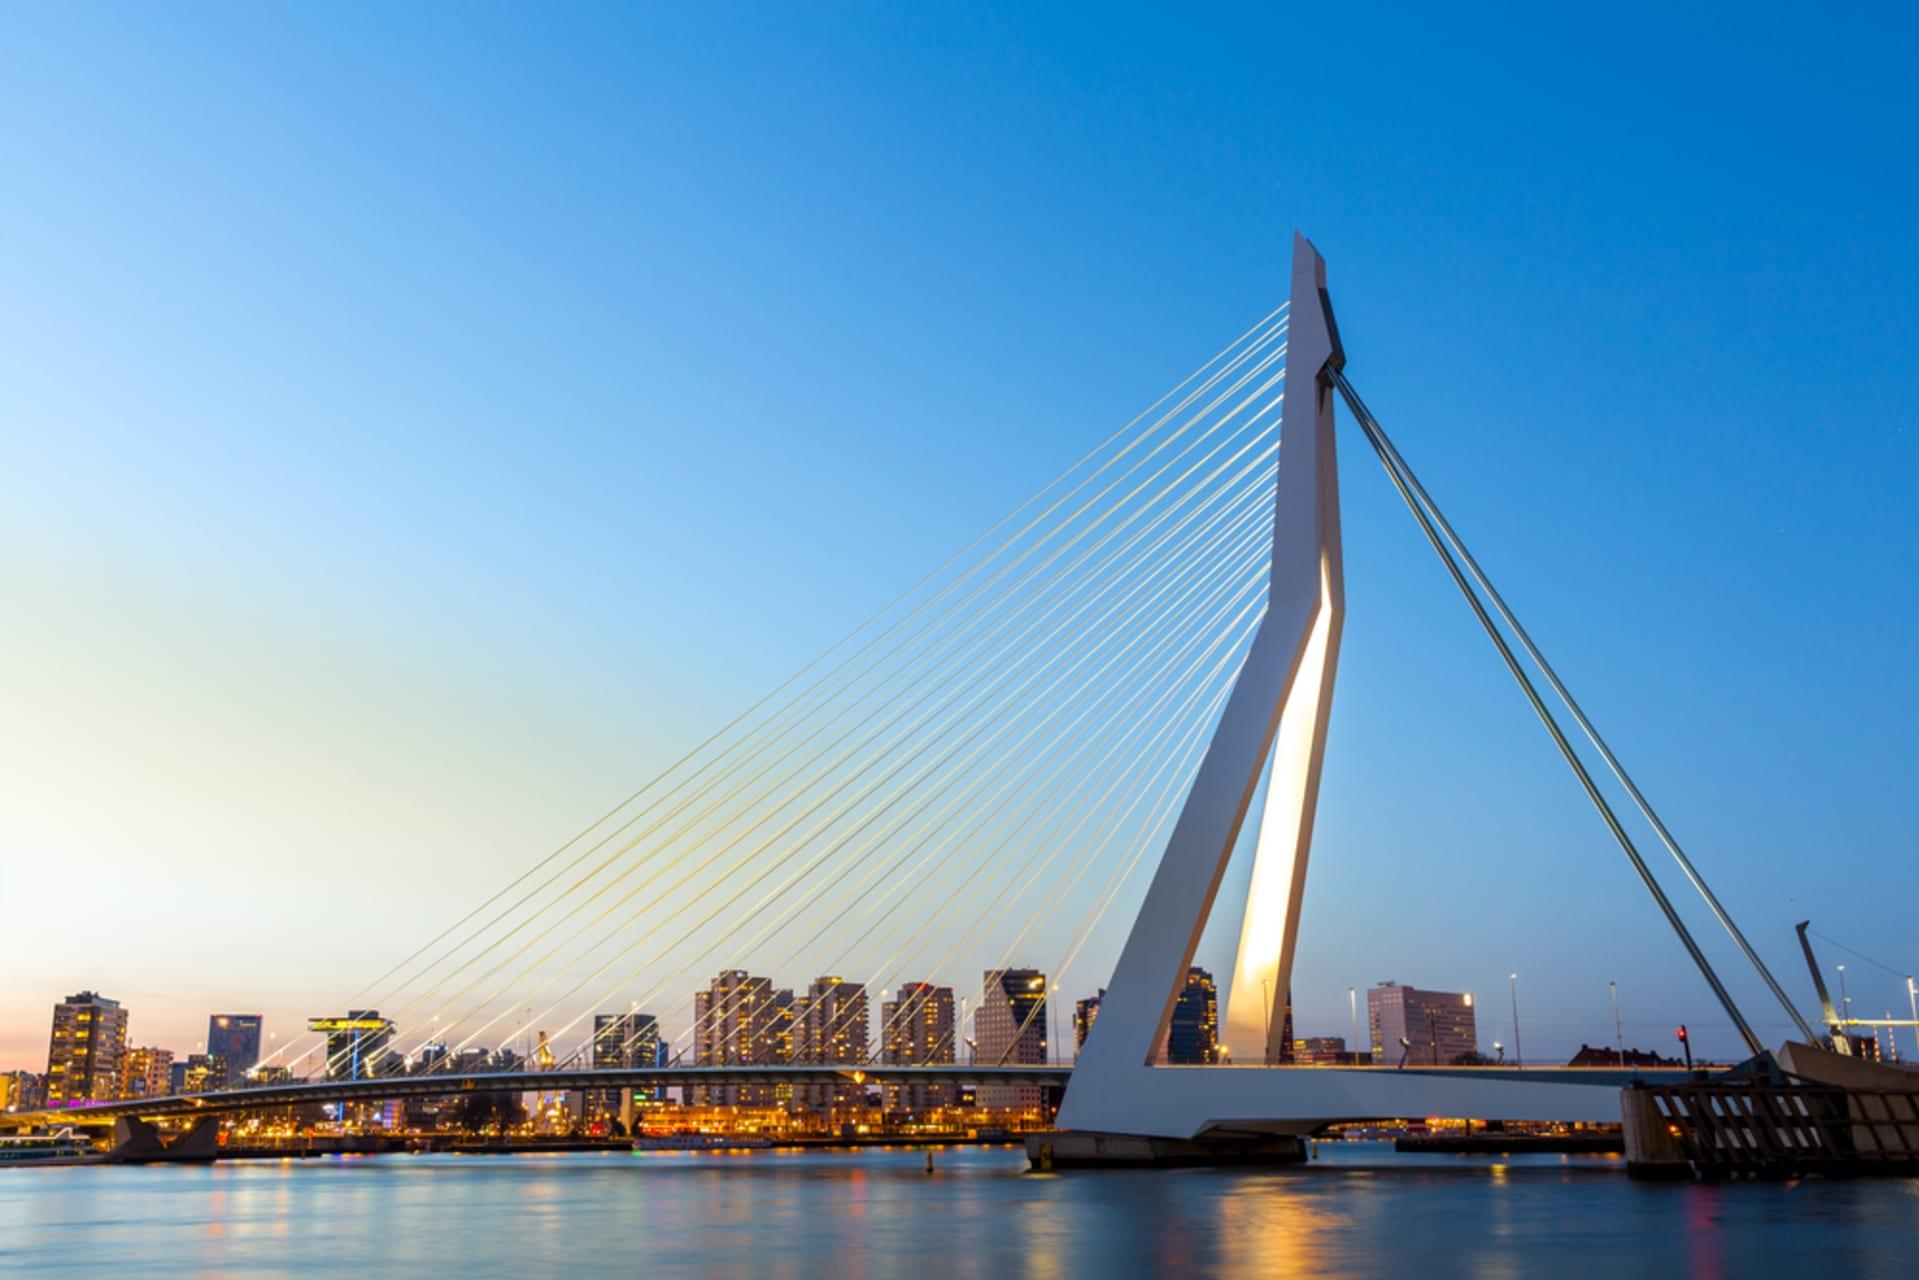 Rotterdam - Rotterdam, the town of modern architecture